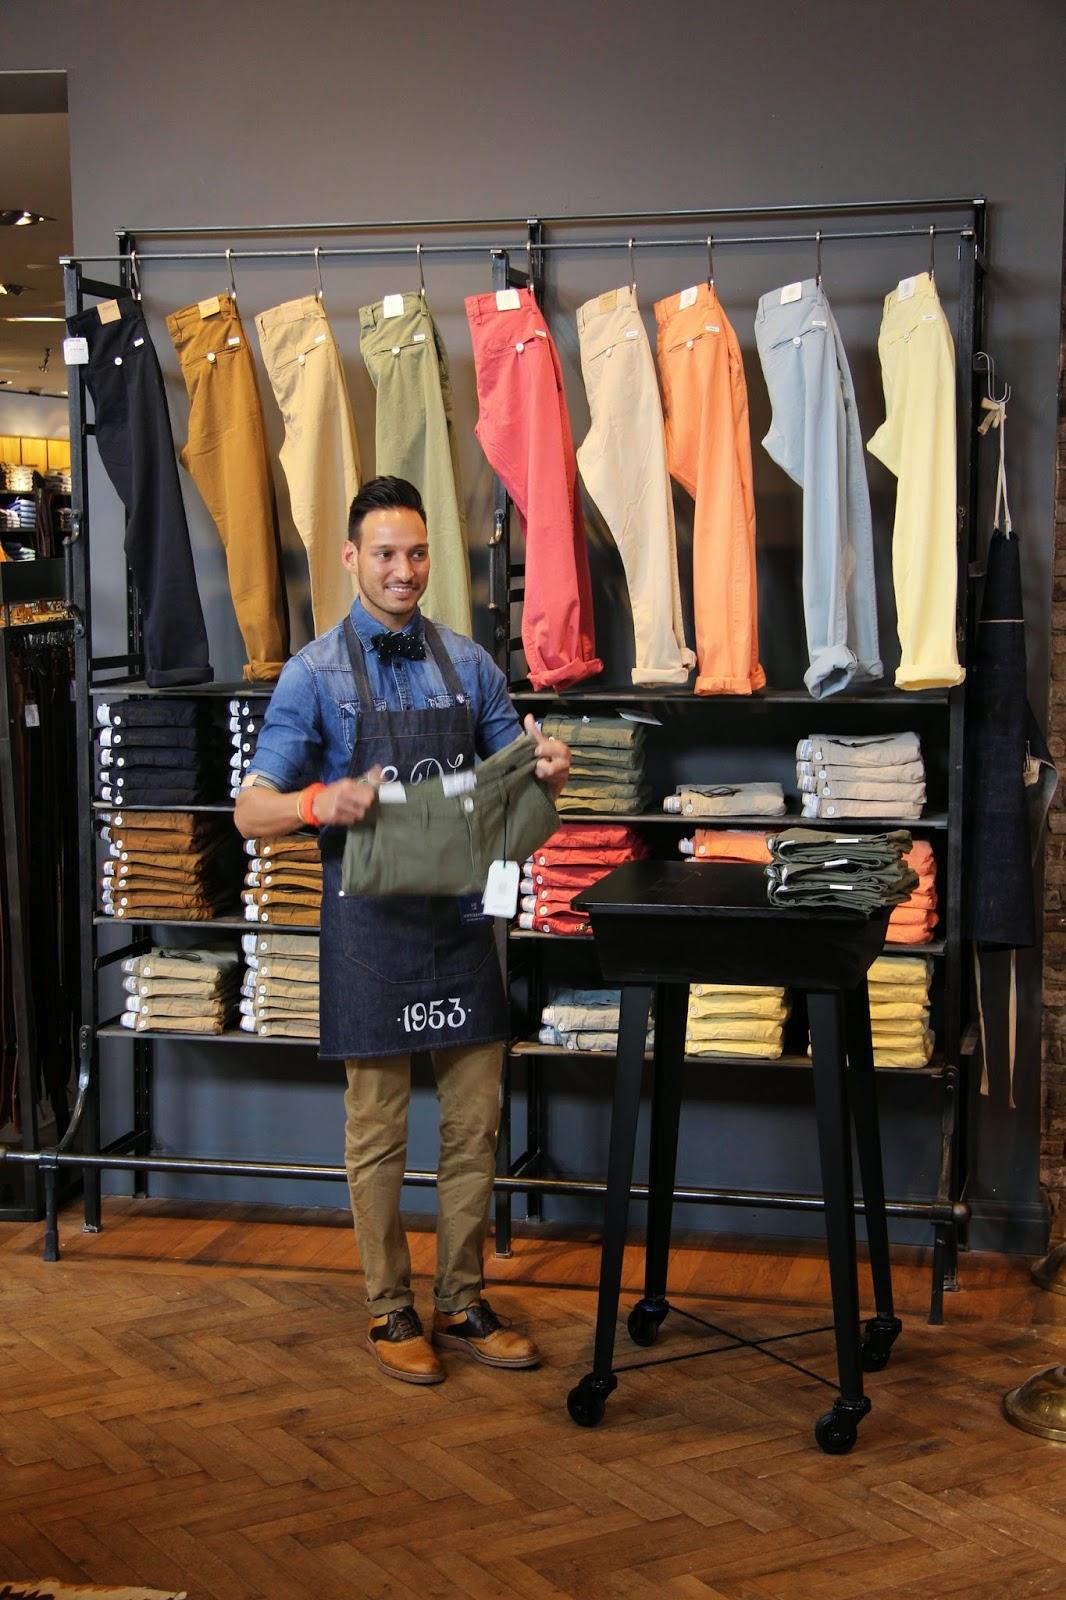 Clothes Rack Home Goods